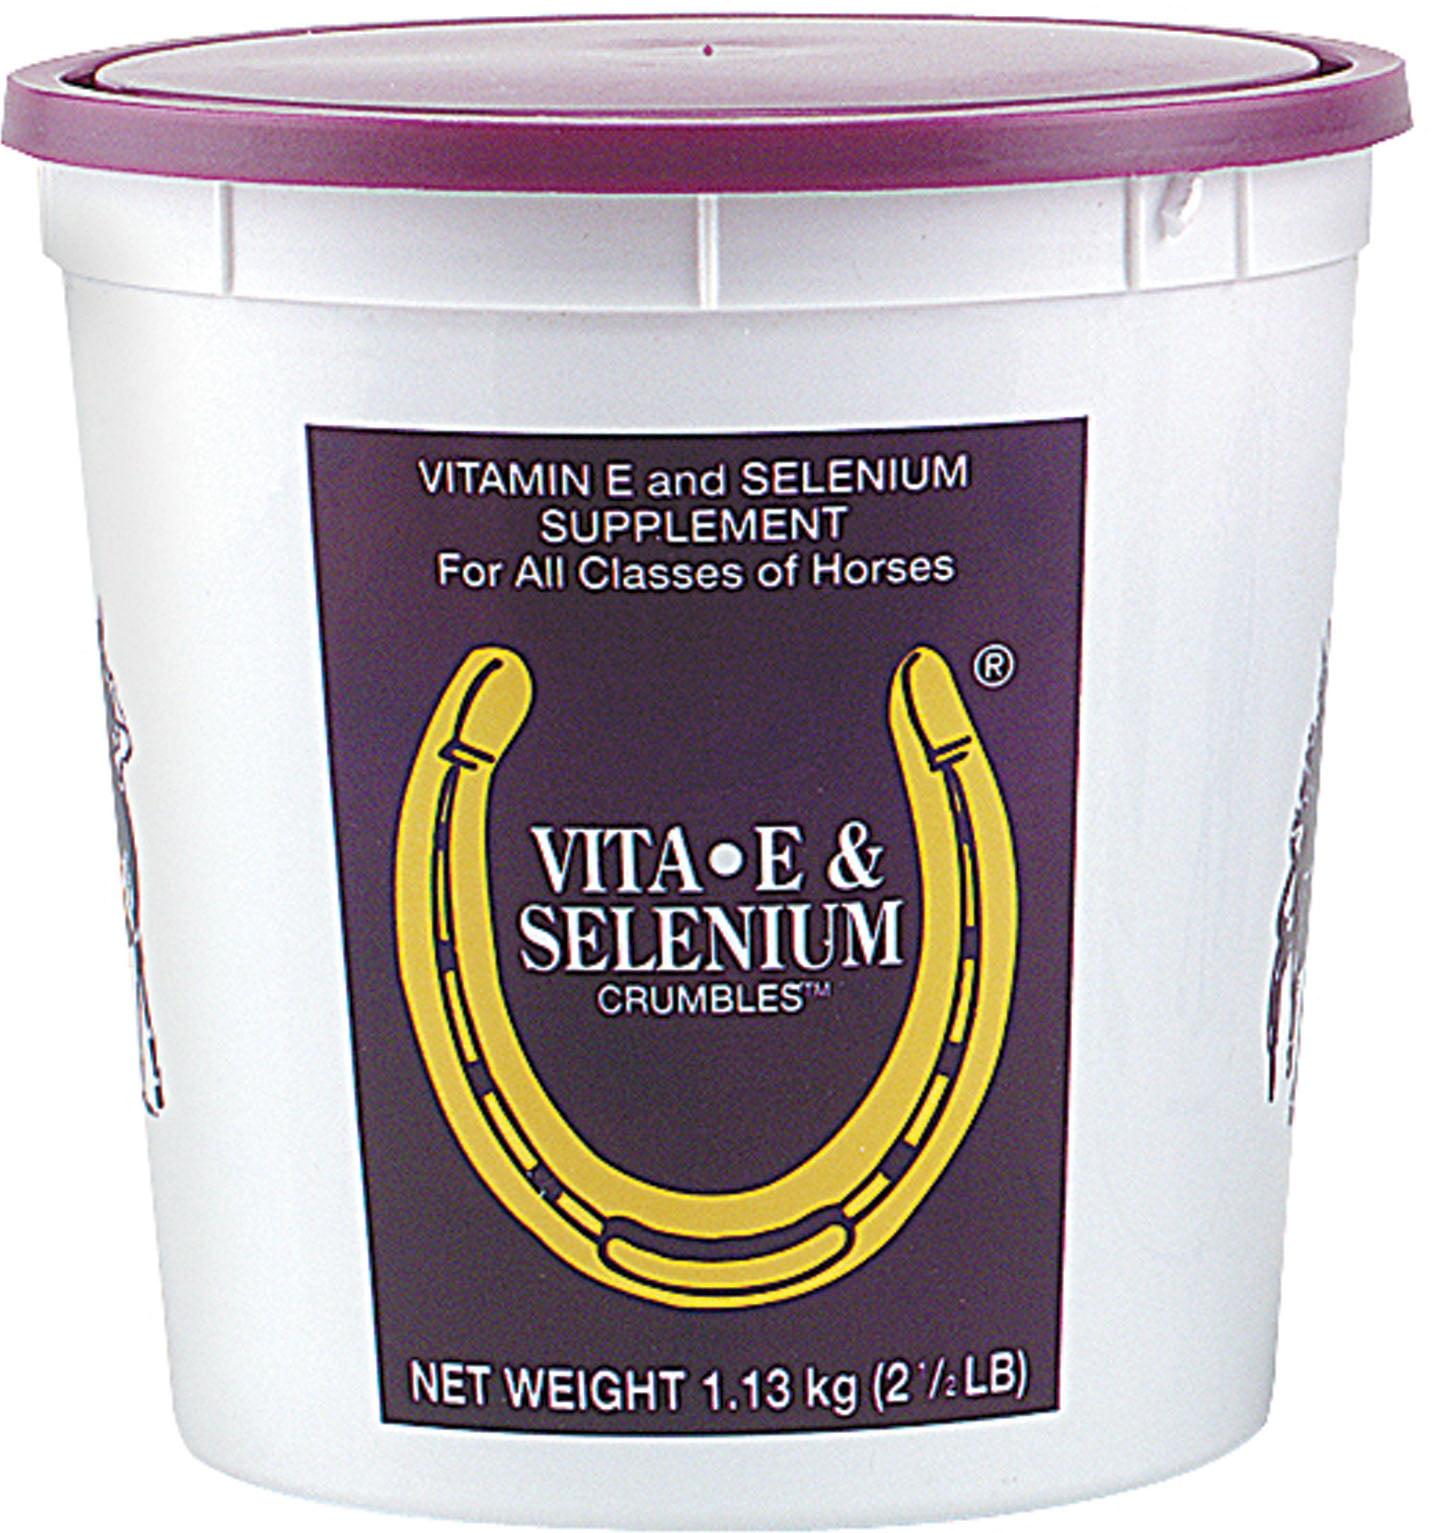 VITA E + SELENIUM CRUMBLES SUPPLEMENT FOR HORSES